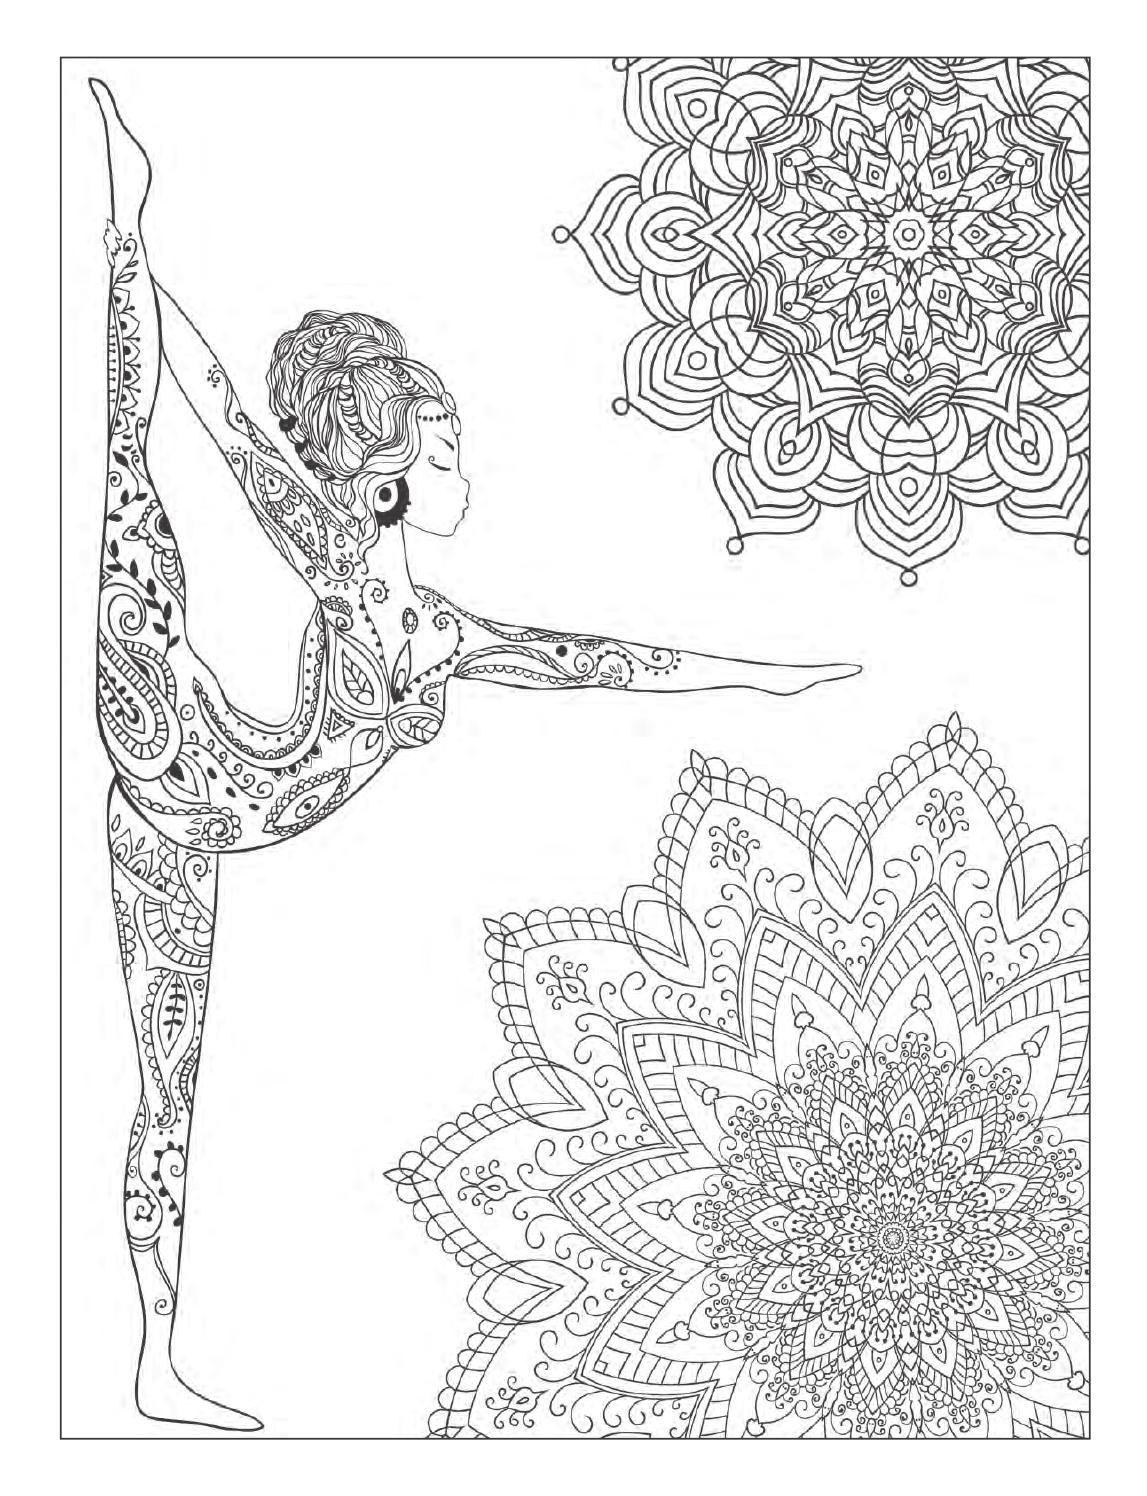 Yoga And Meditation Coloring Book For Adults With Poses Mandalas By Alexandru Ciobanu